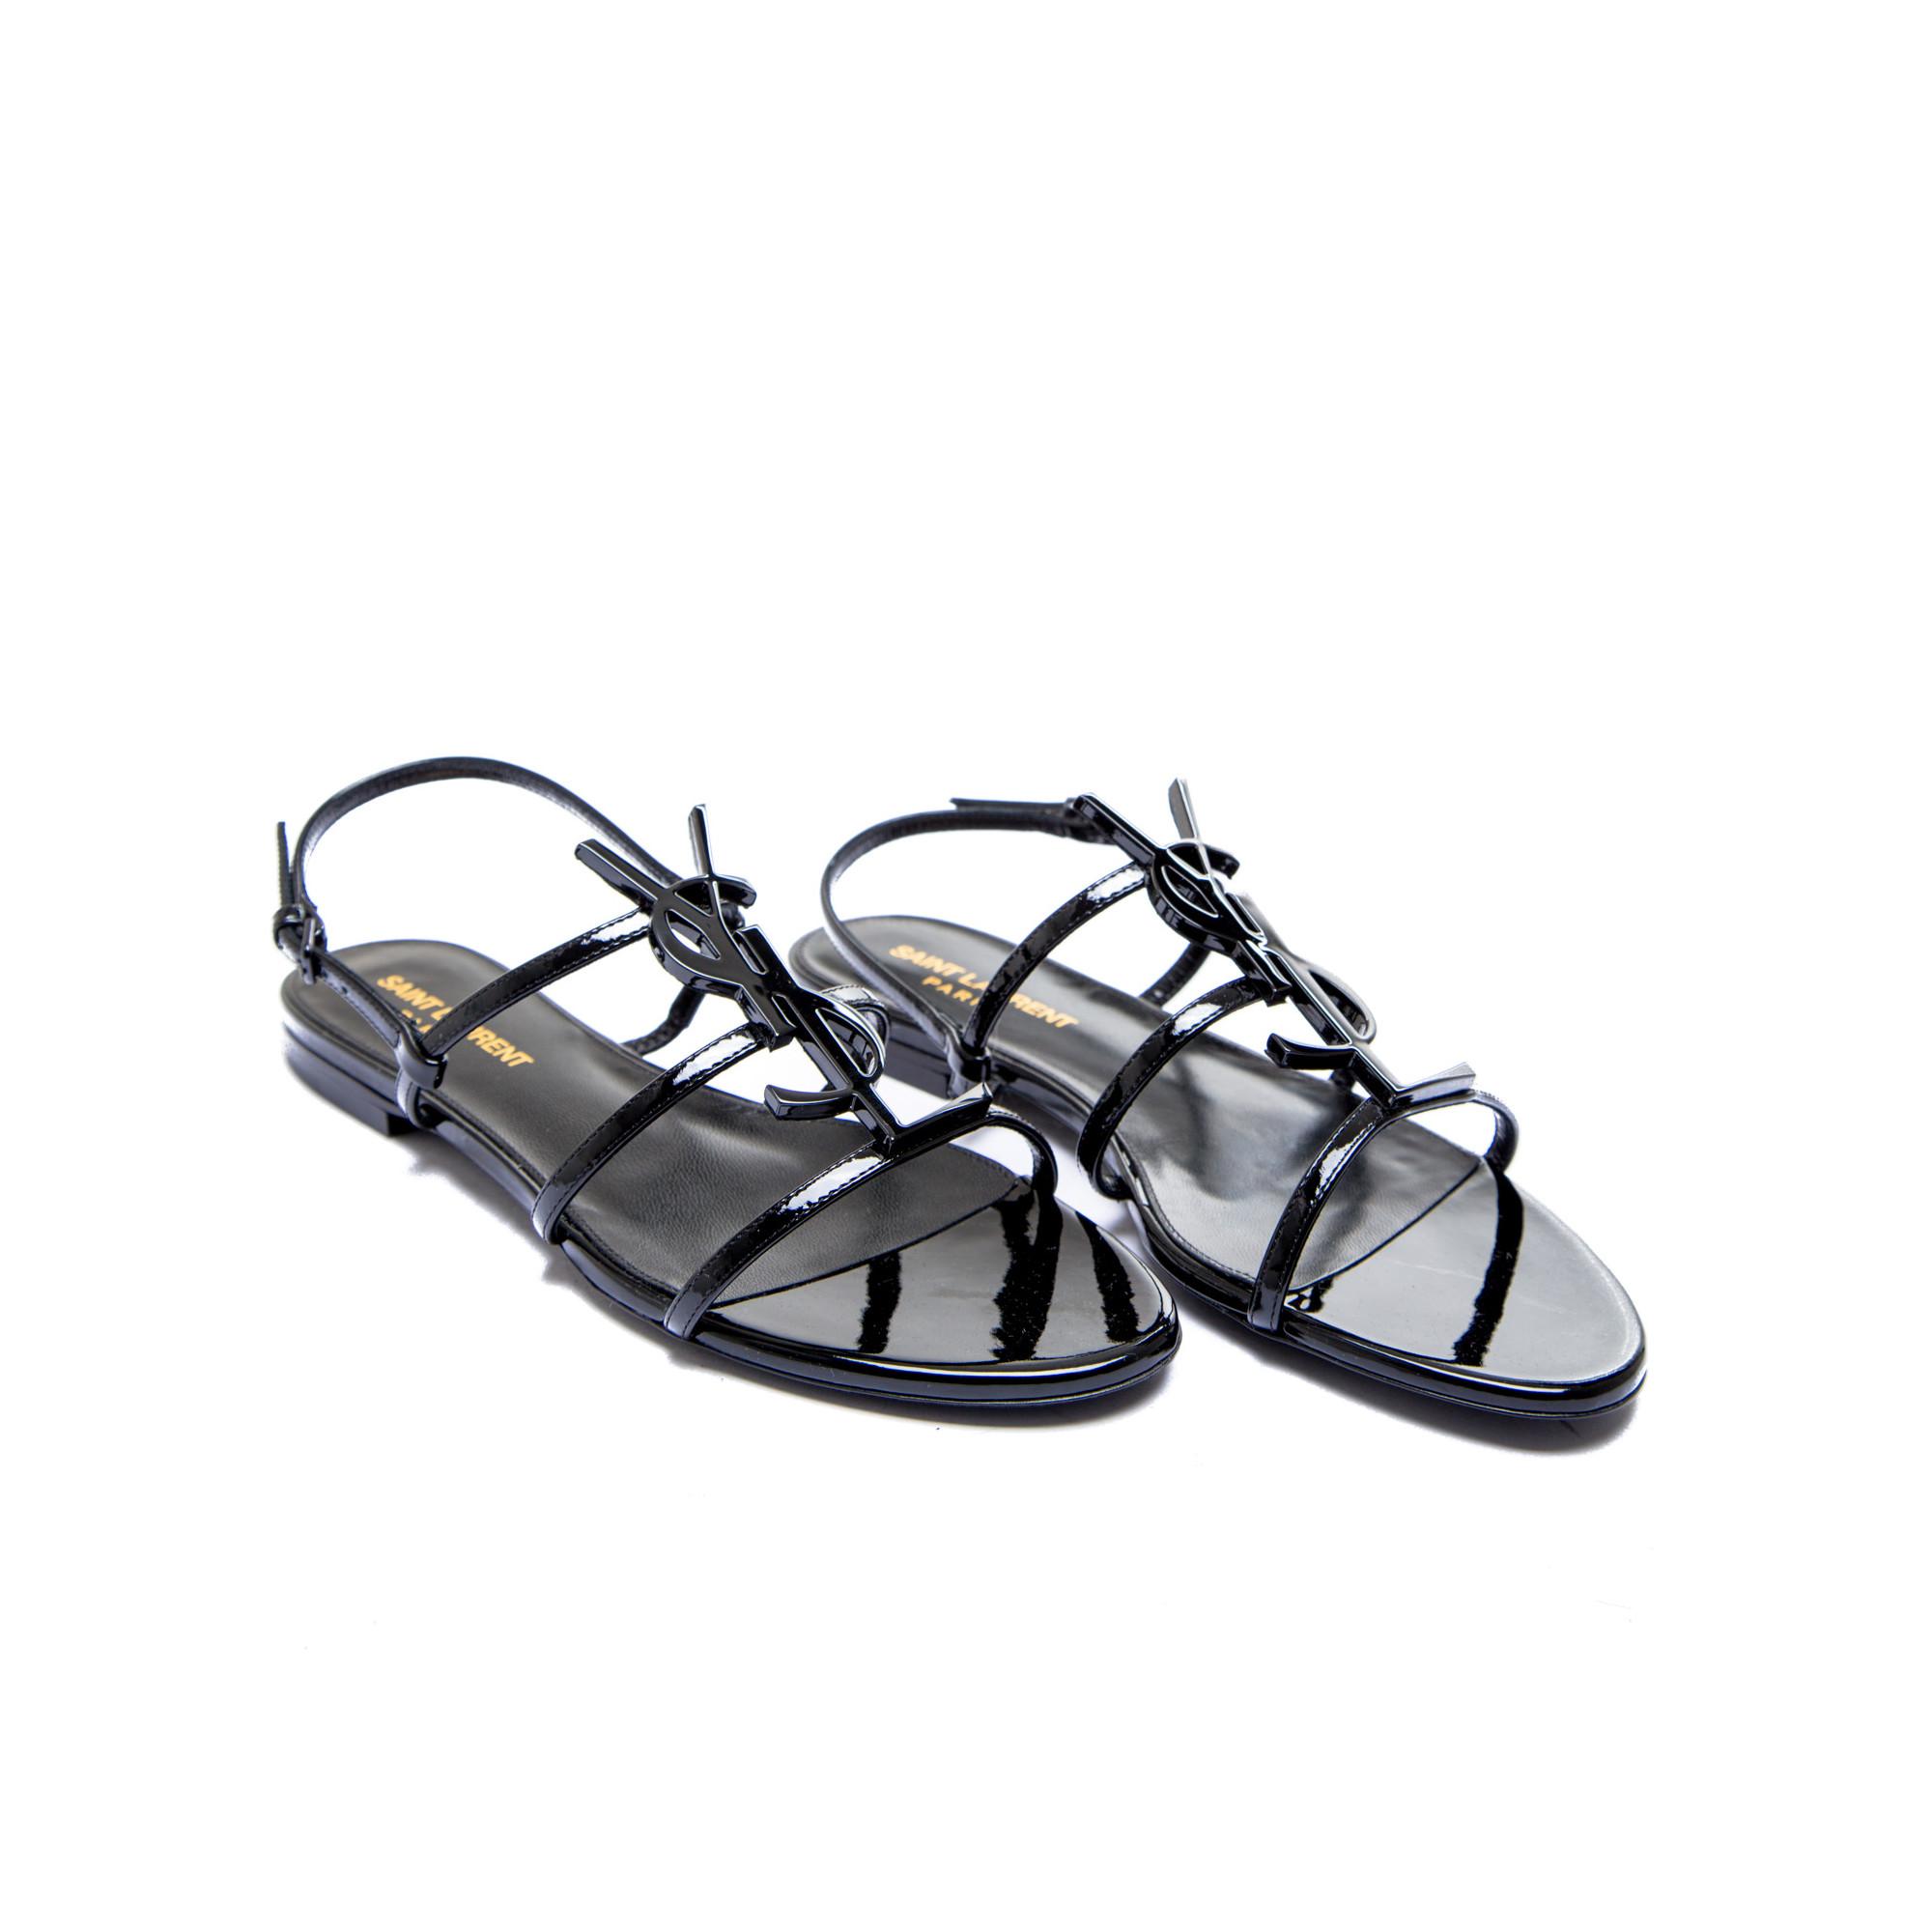 60170f582f65 ... Saint Laurent sandals cassandra 05 ysl black Saint Laurent sandals  cassandra 05 ysl black - www ...